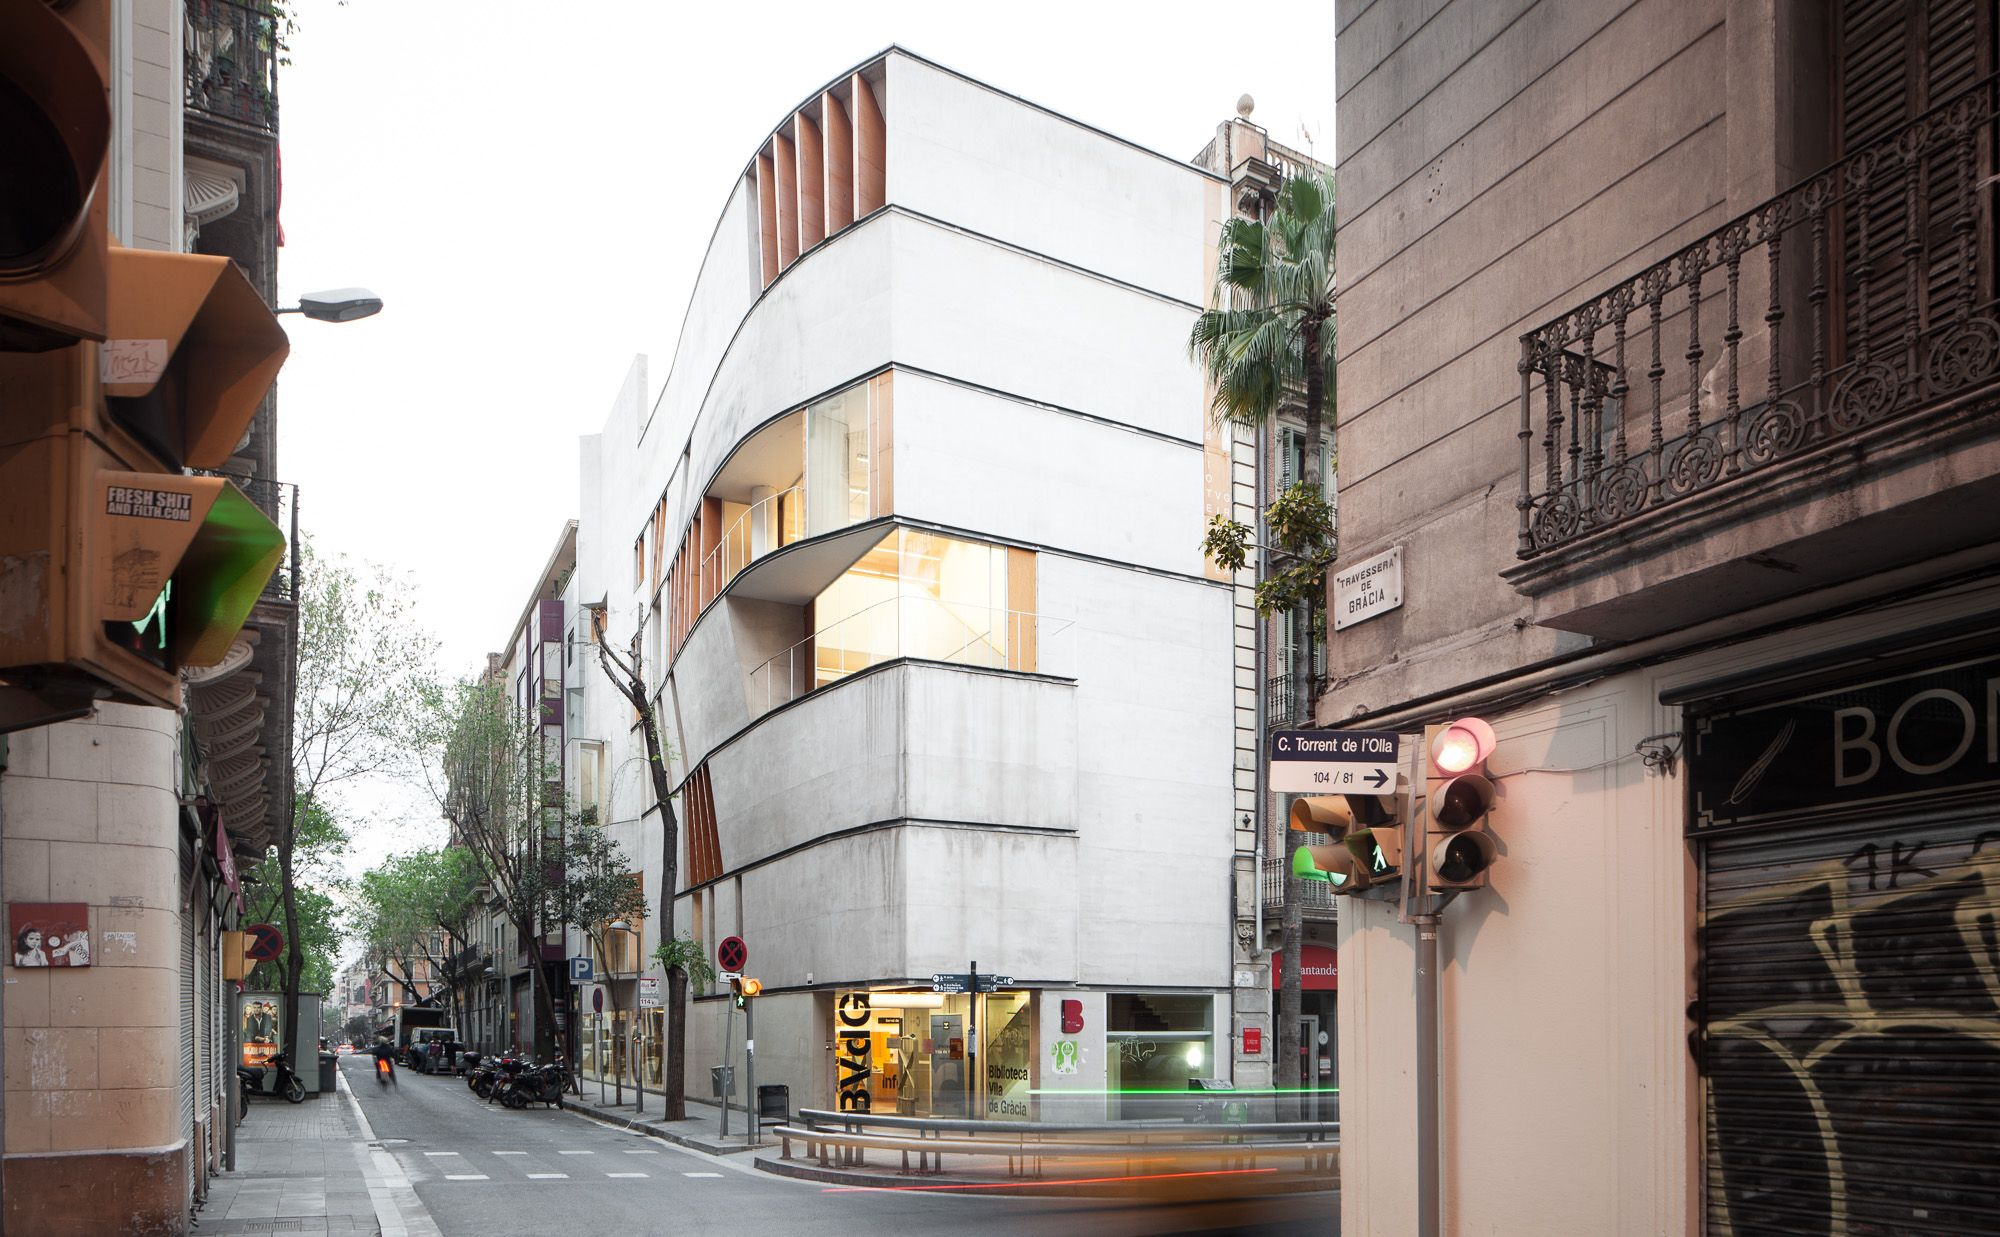 Josep llin s a f a s i a for Biblioteca arquitectura